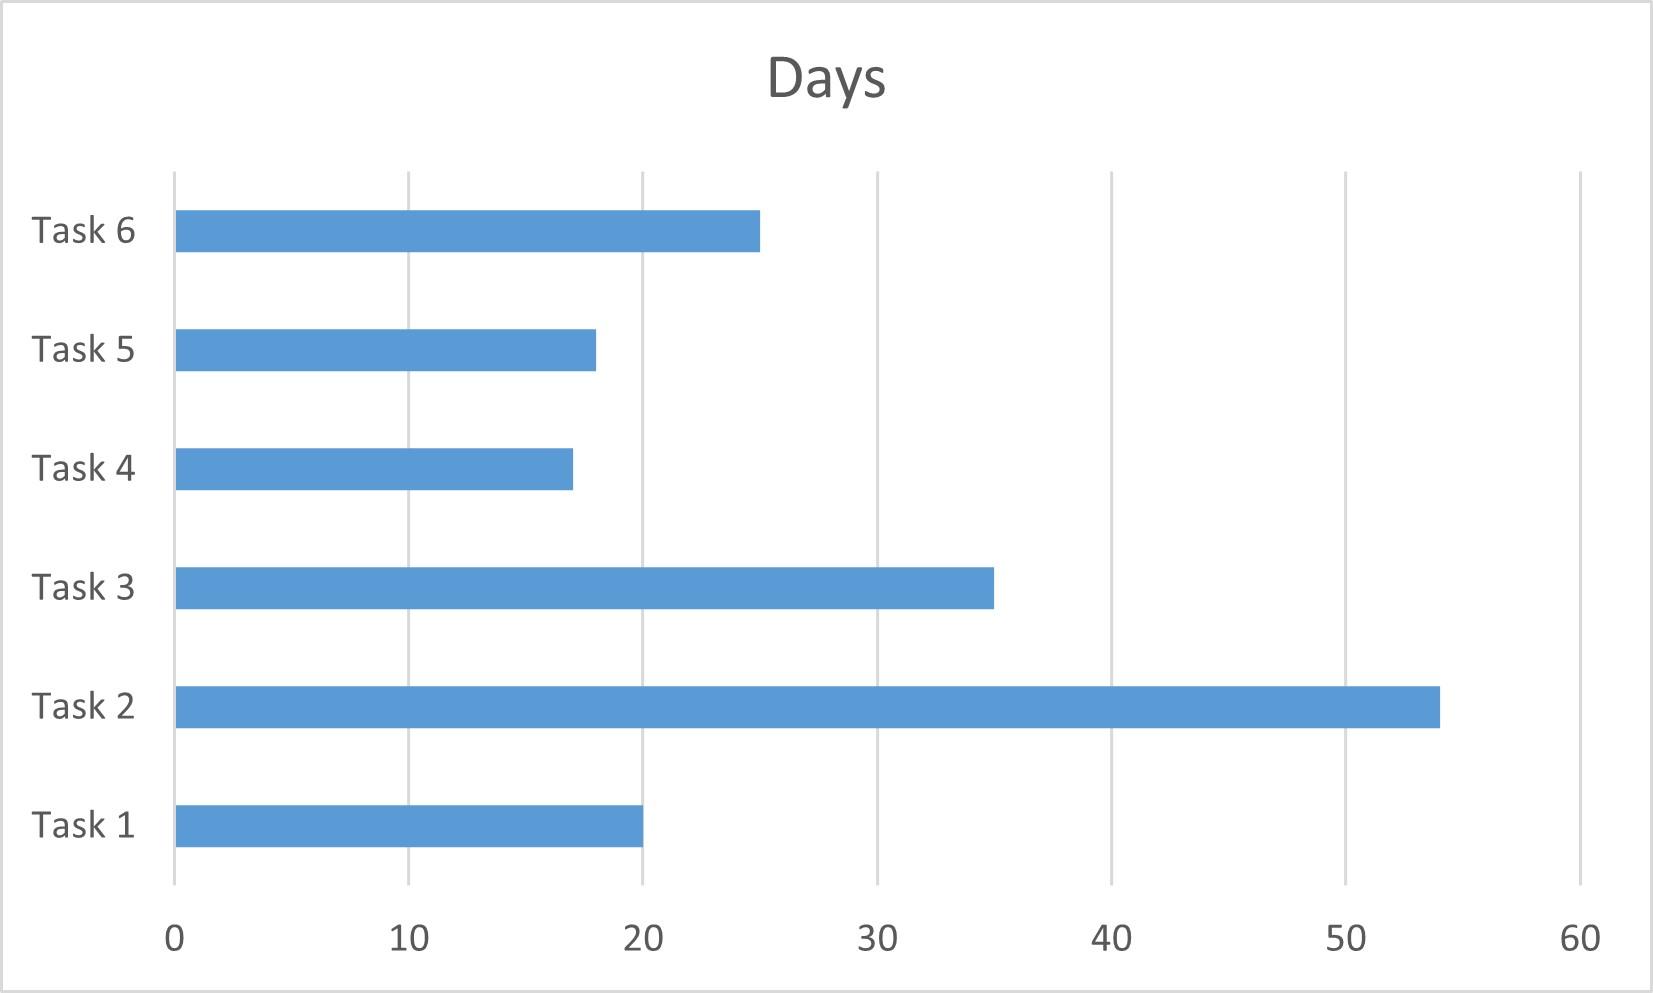 Simple Bar Graph Result